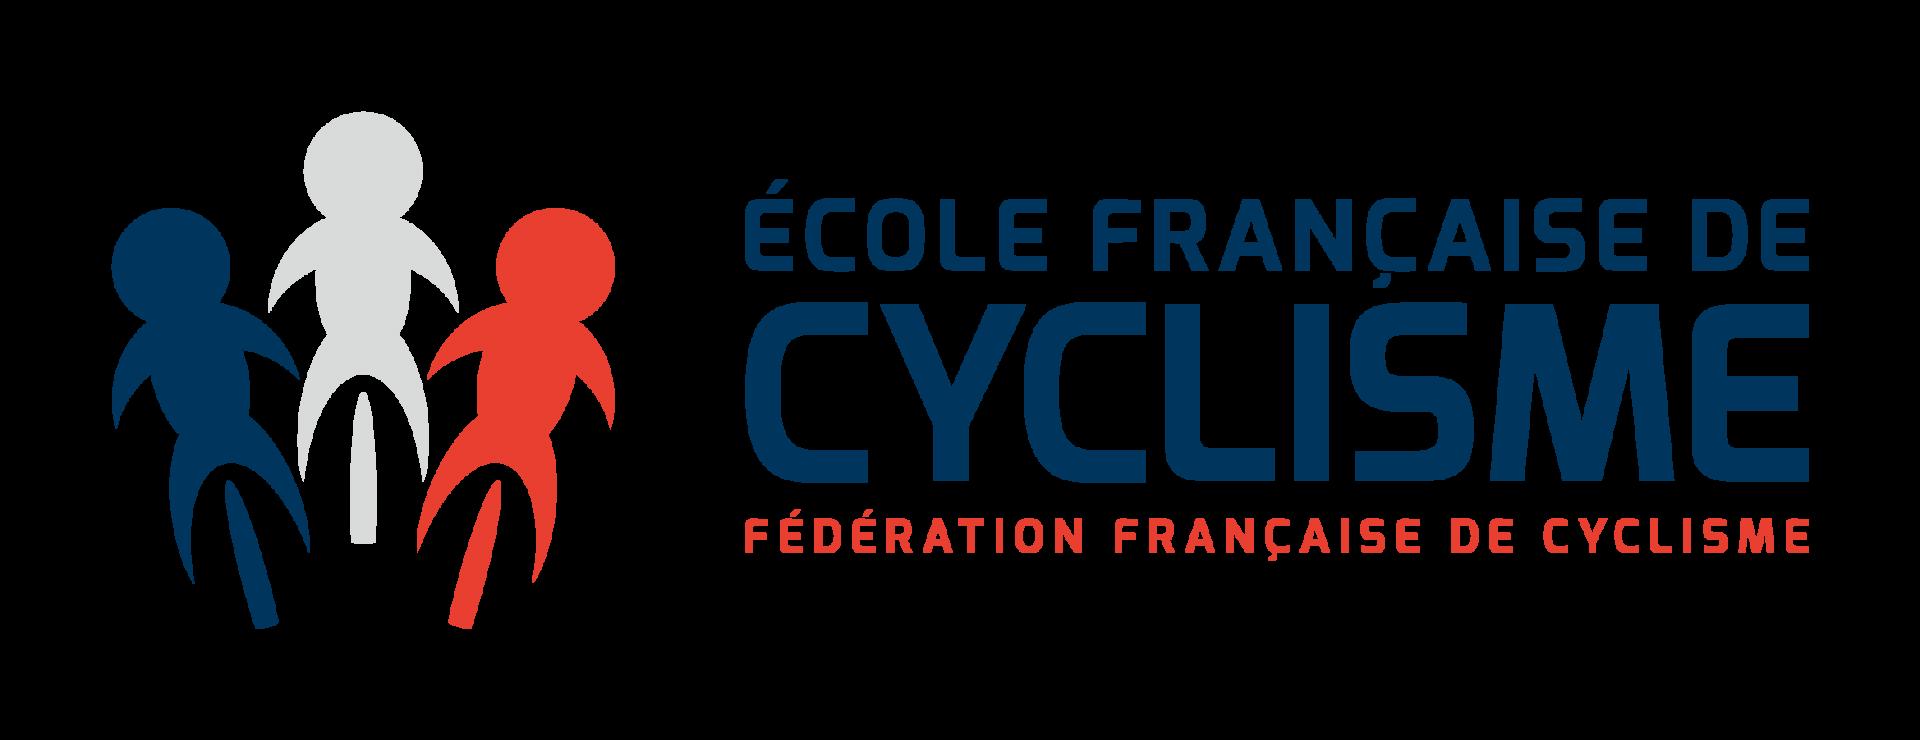 Ecoledecyclisme h fondblanc